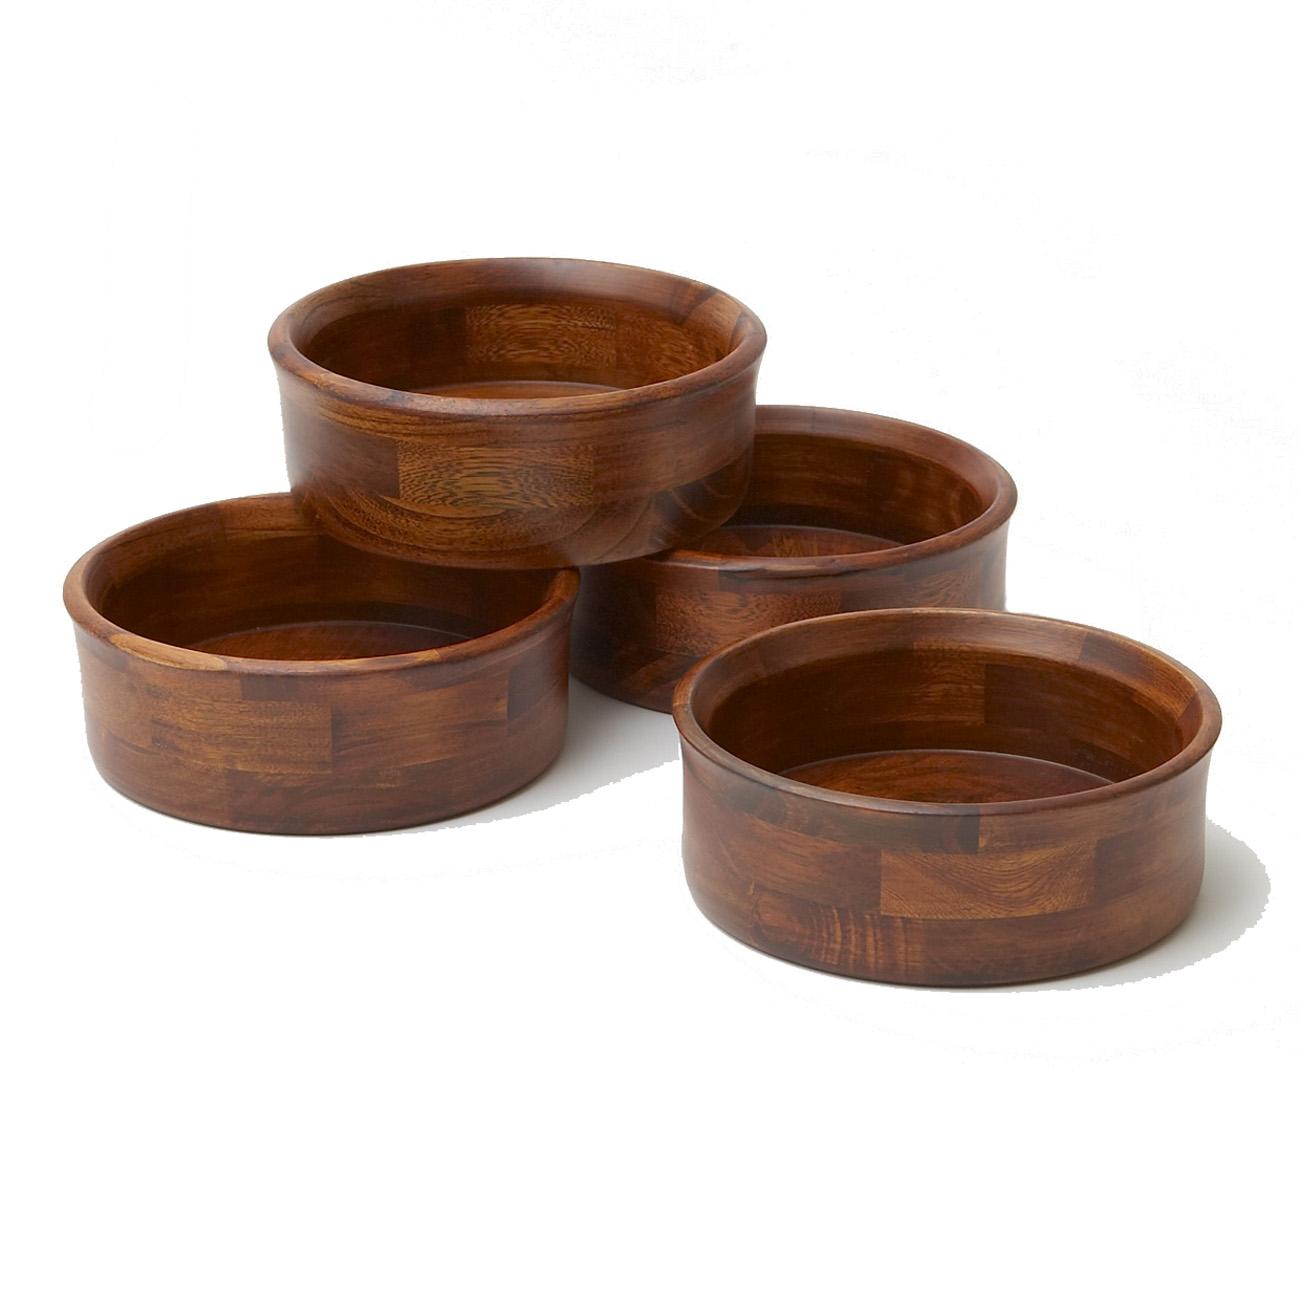 7 Piece Wood Salad Serving Bowl Set Woodard Charles